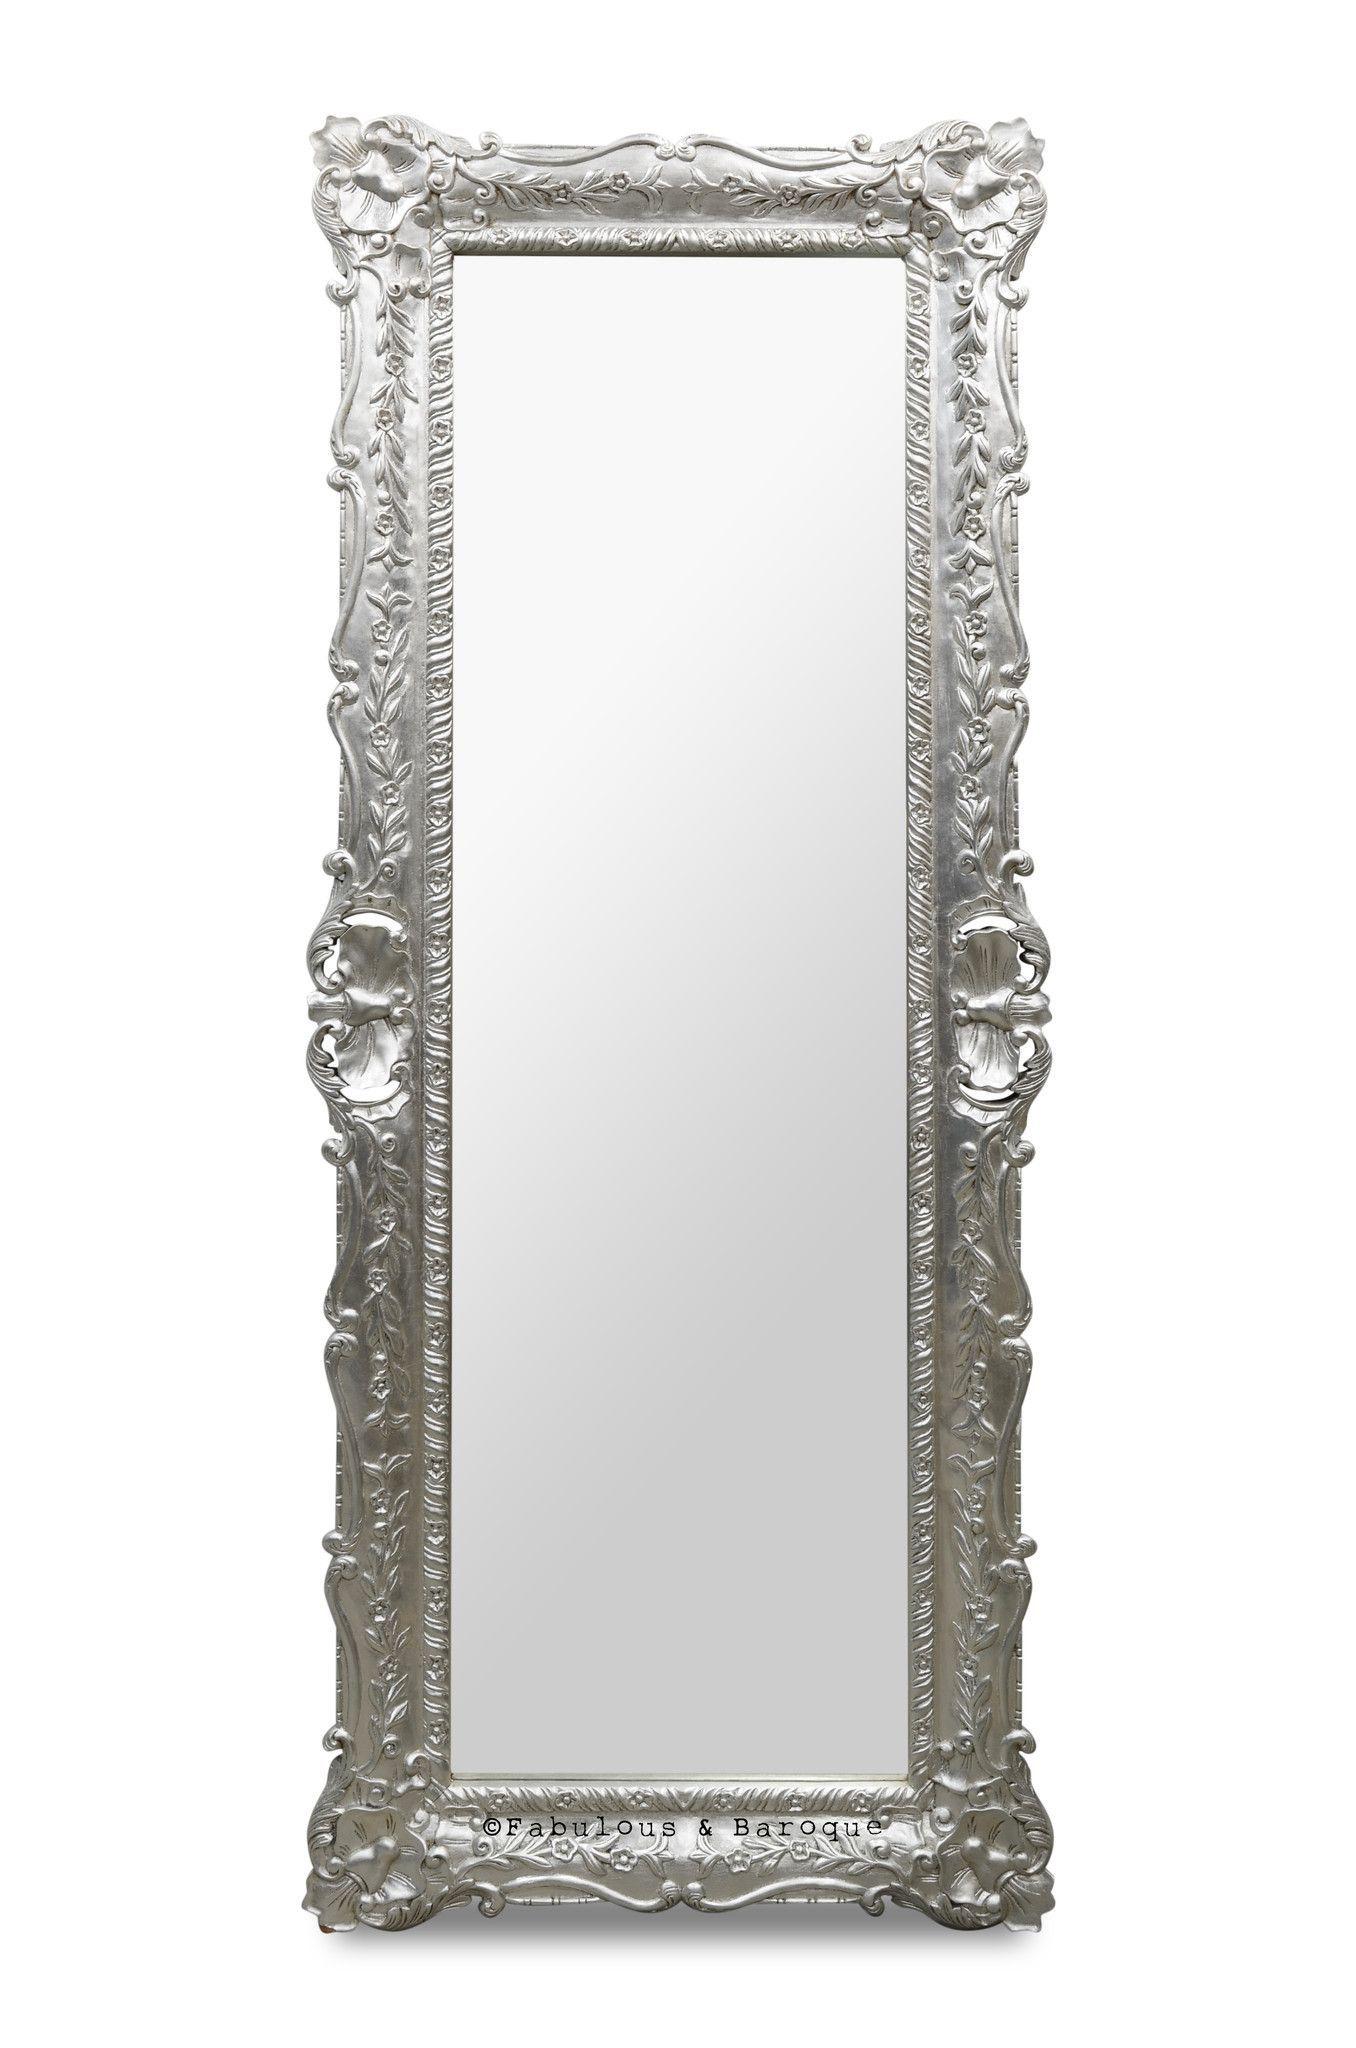 Modern Baroque Furniture And Interior Design Rococo Furniture Baroque Furniture Baroque Mirror